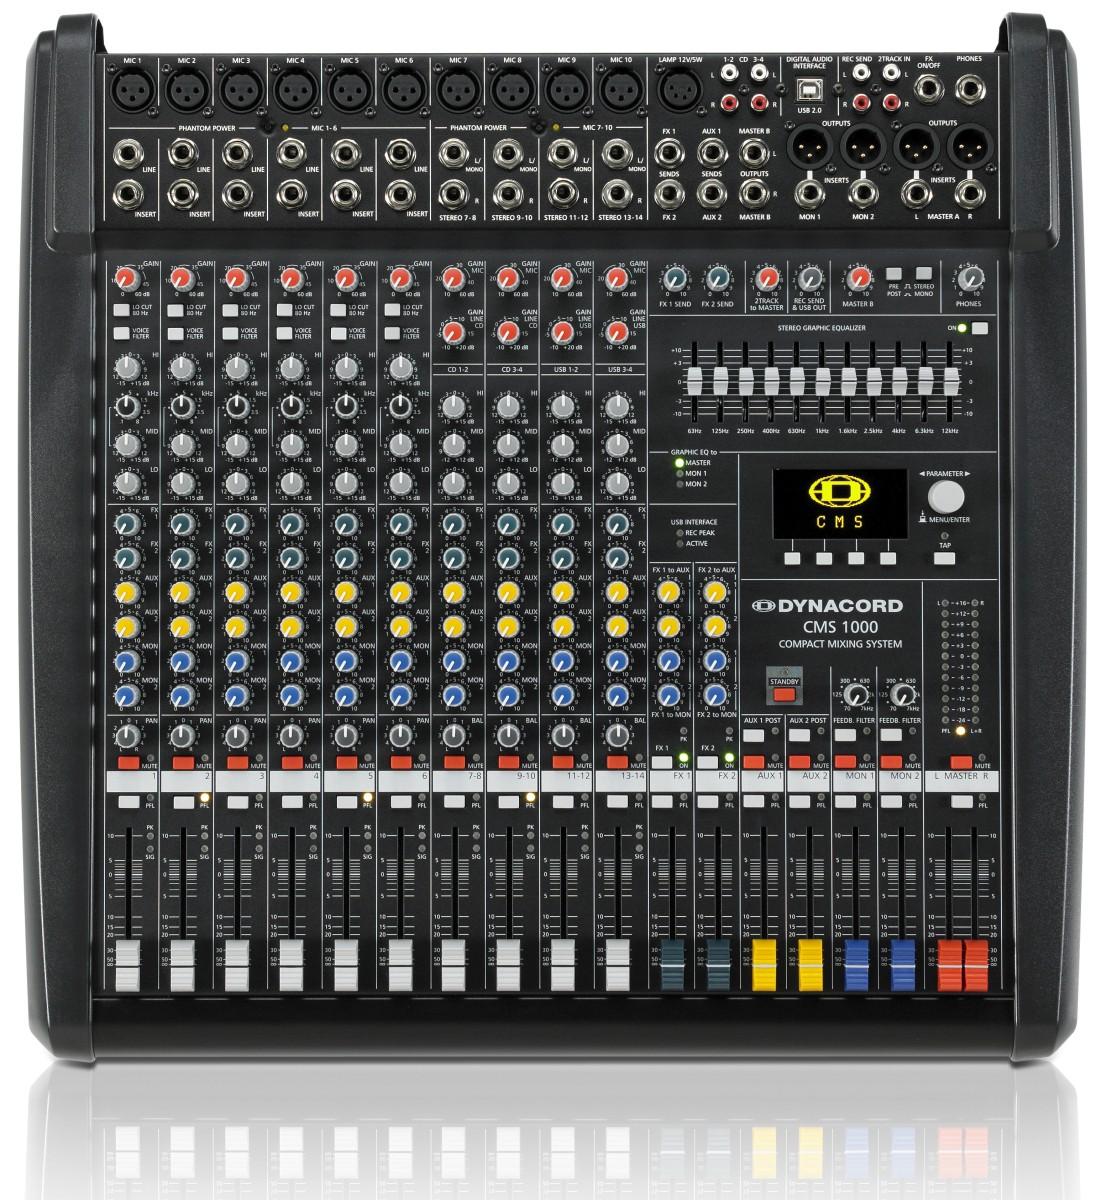 Dynacord CMS 1000 MK3 10 Kanal Kompaktmixer